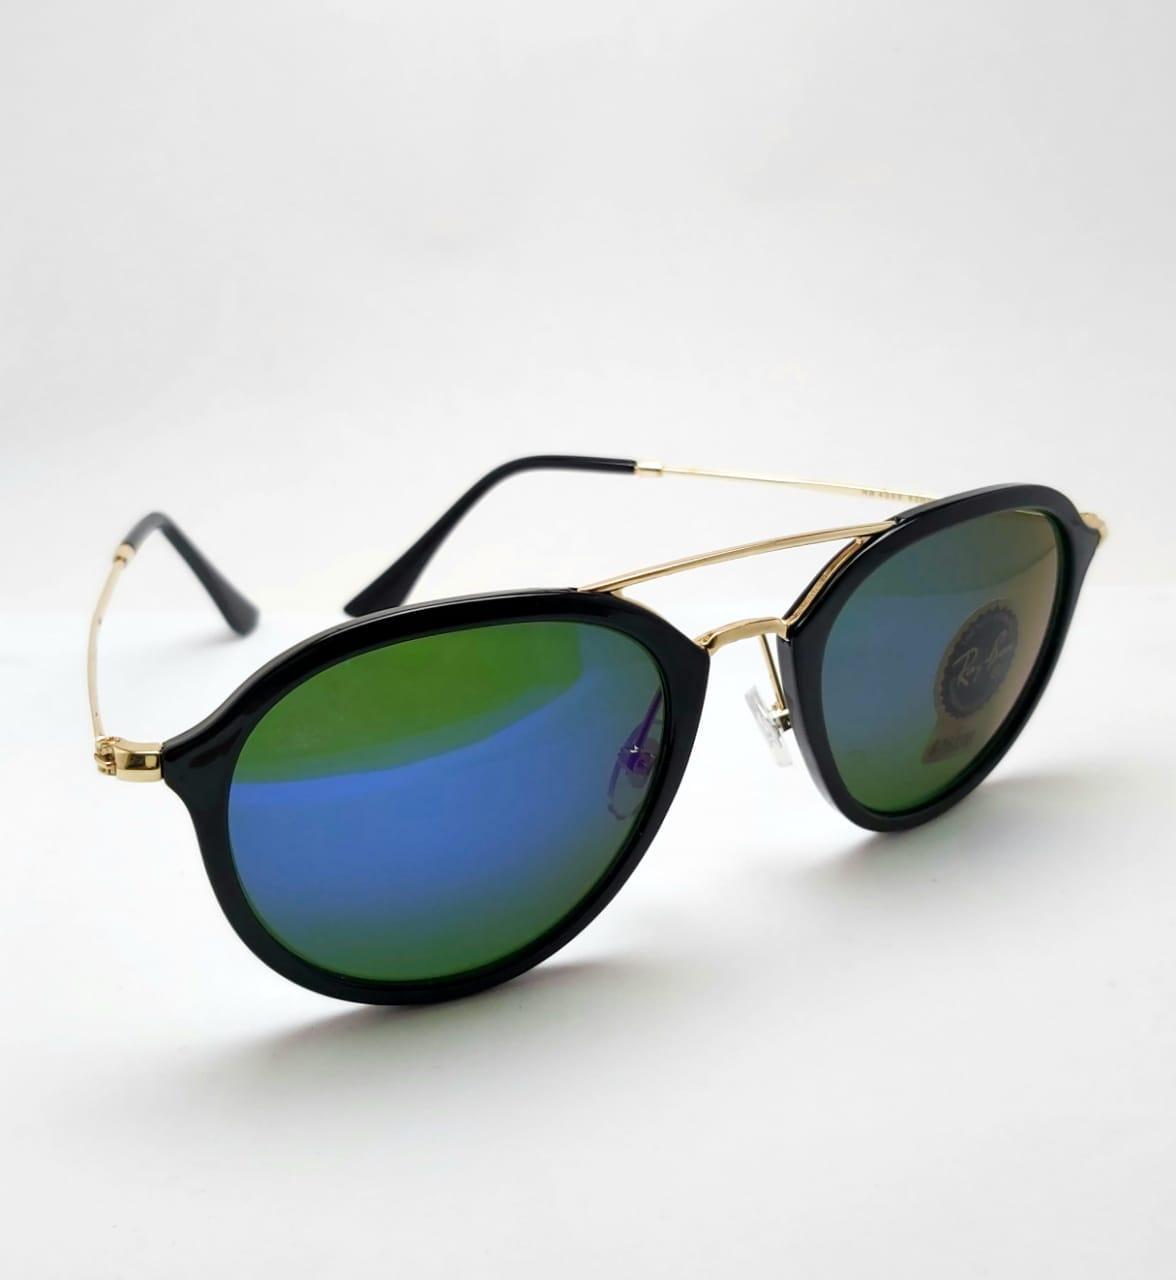 RB-4253 SUNGLASSES BLACK & GOLD FRAME _ BLUE MERCURY GLASSES